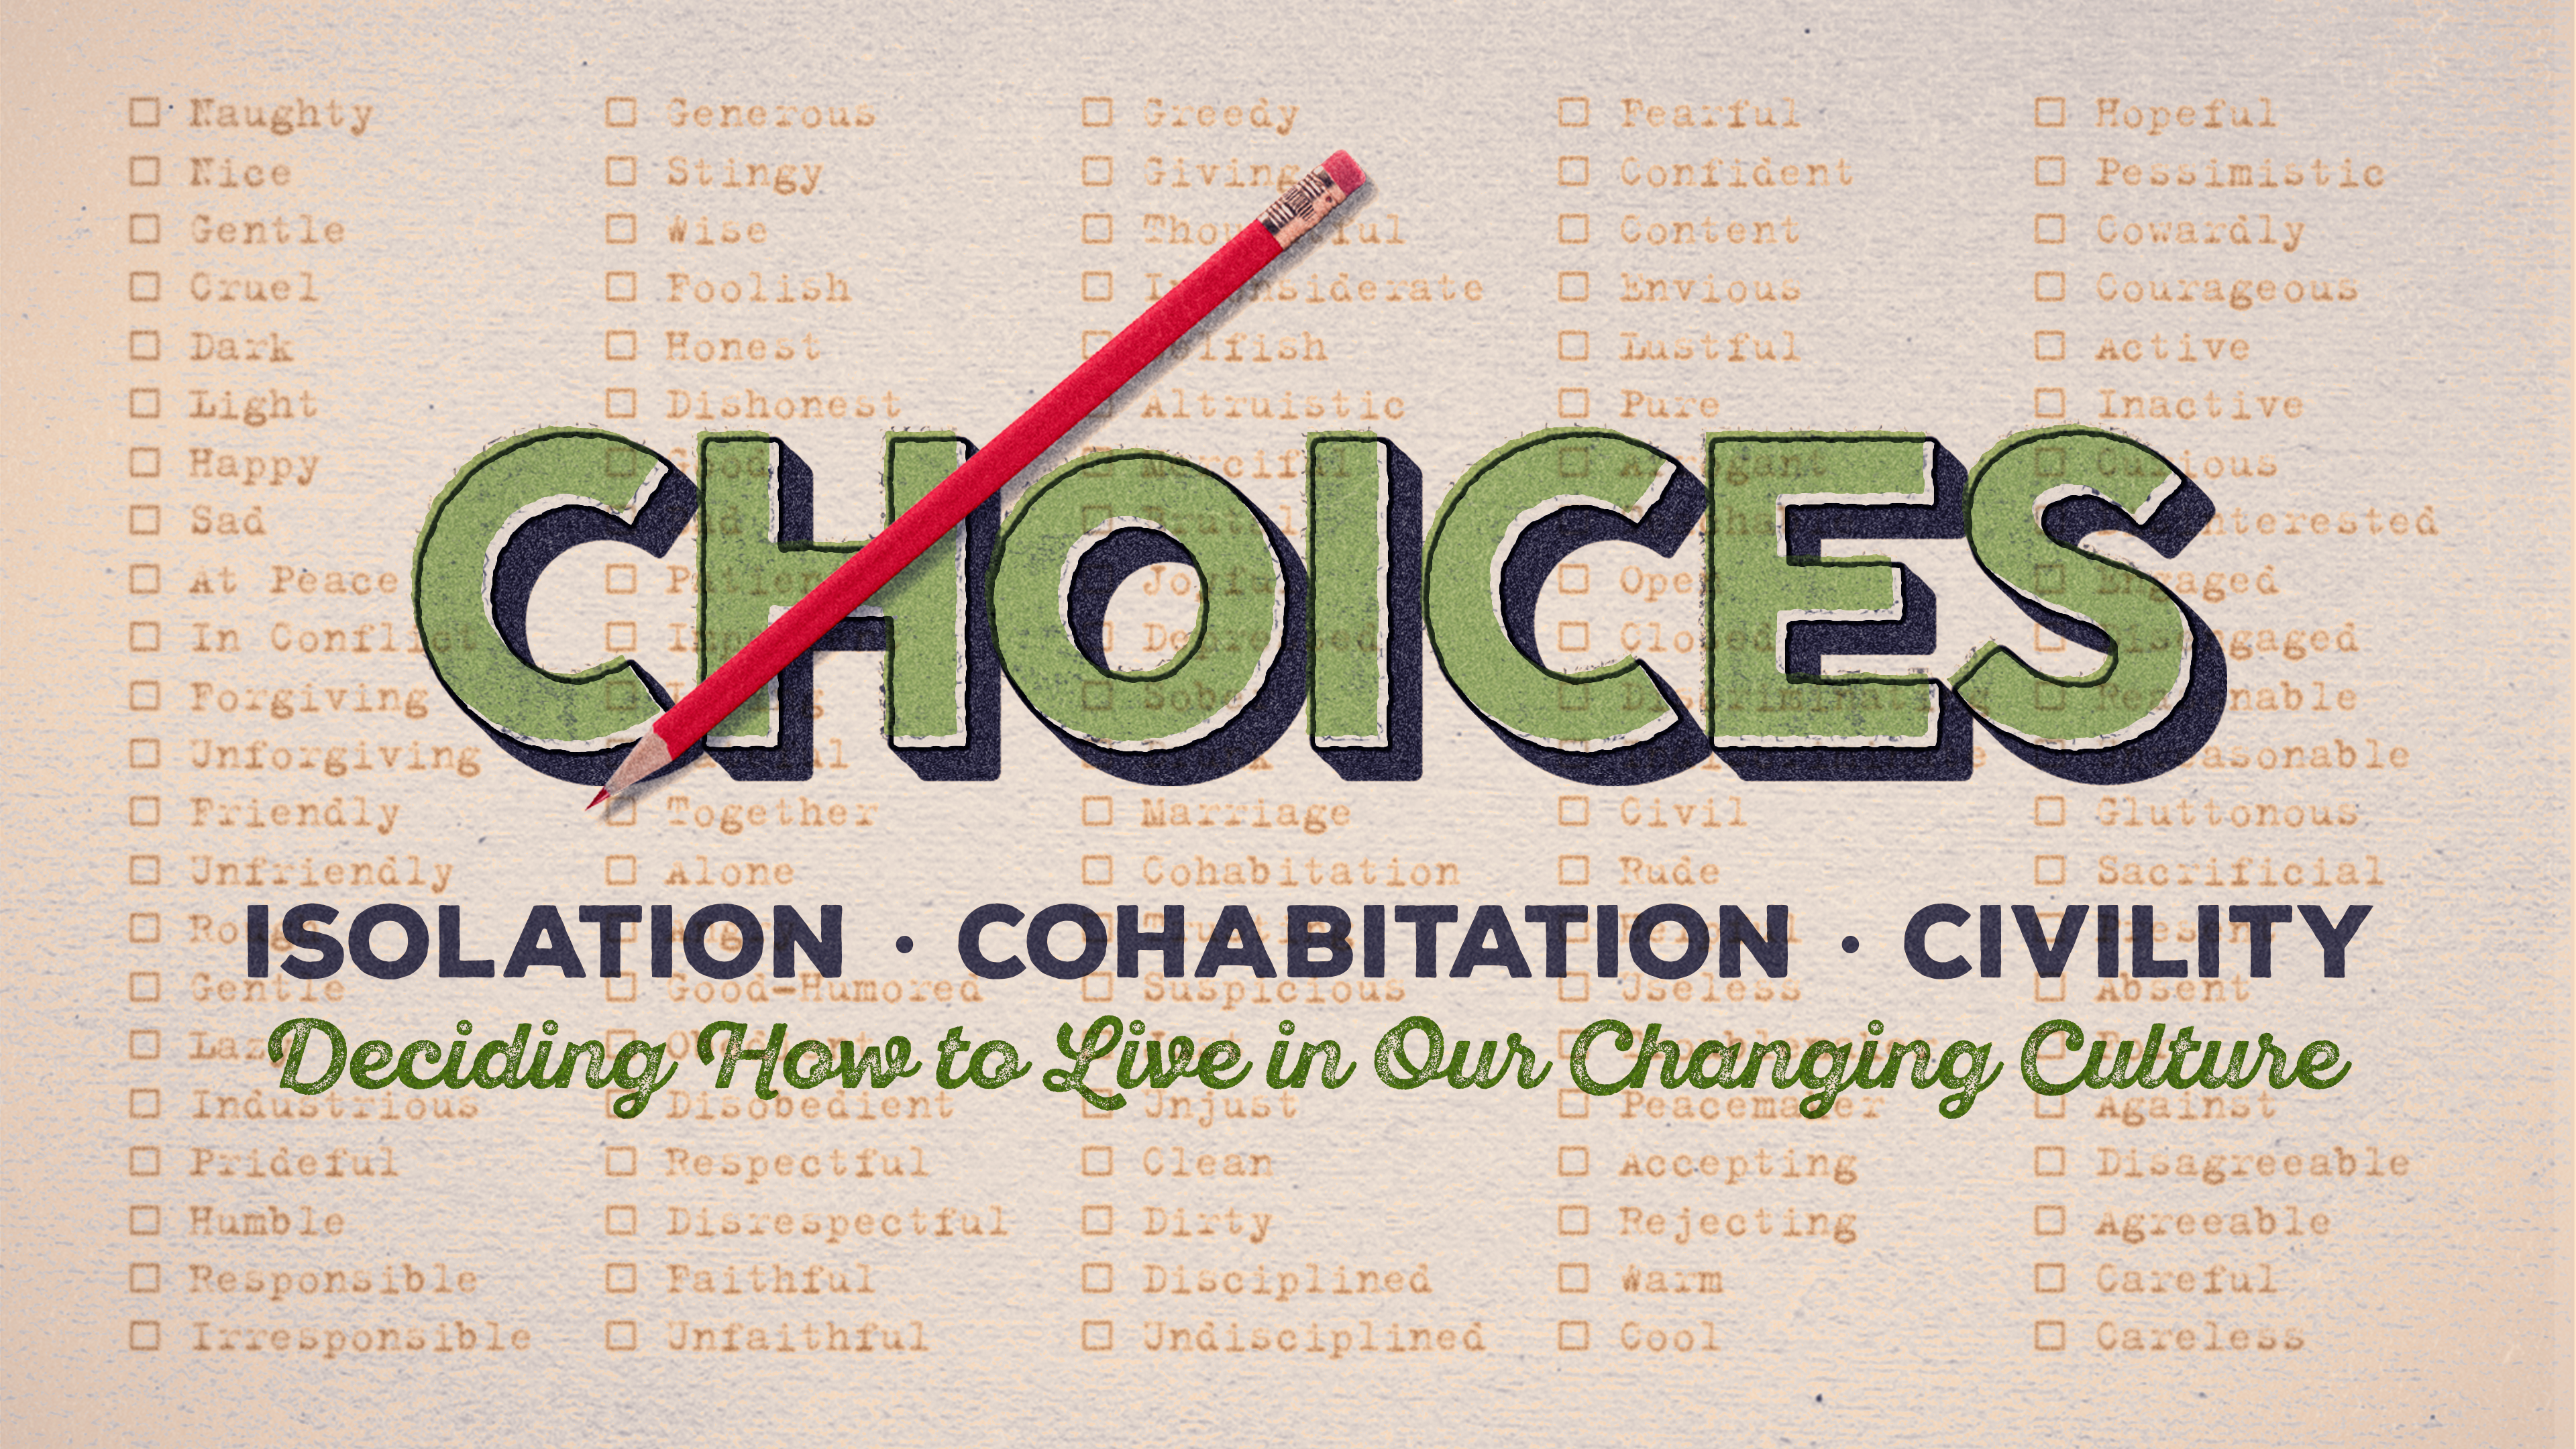 Choices-Web-Carosel-1920-x-1080@2x